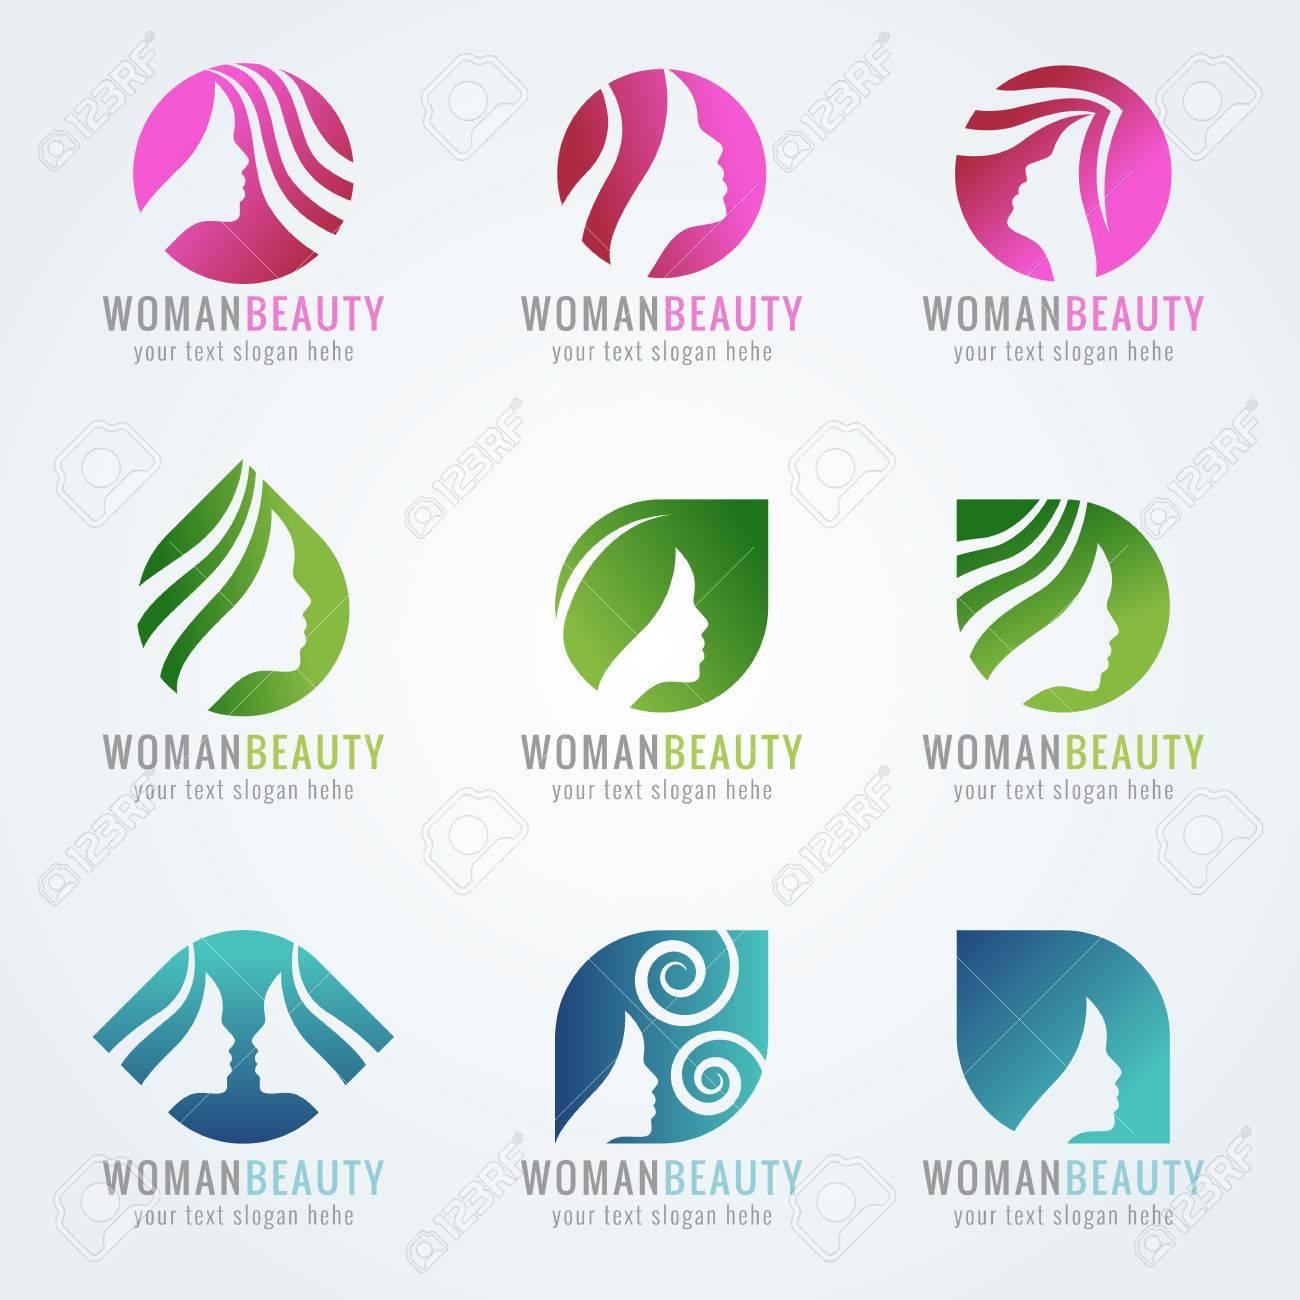 Woman beauty face and hair logo vector set design - 58013100